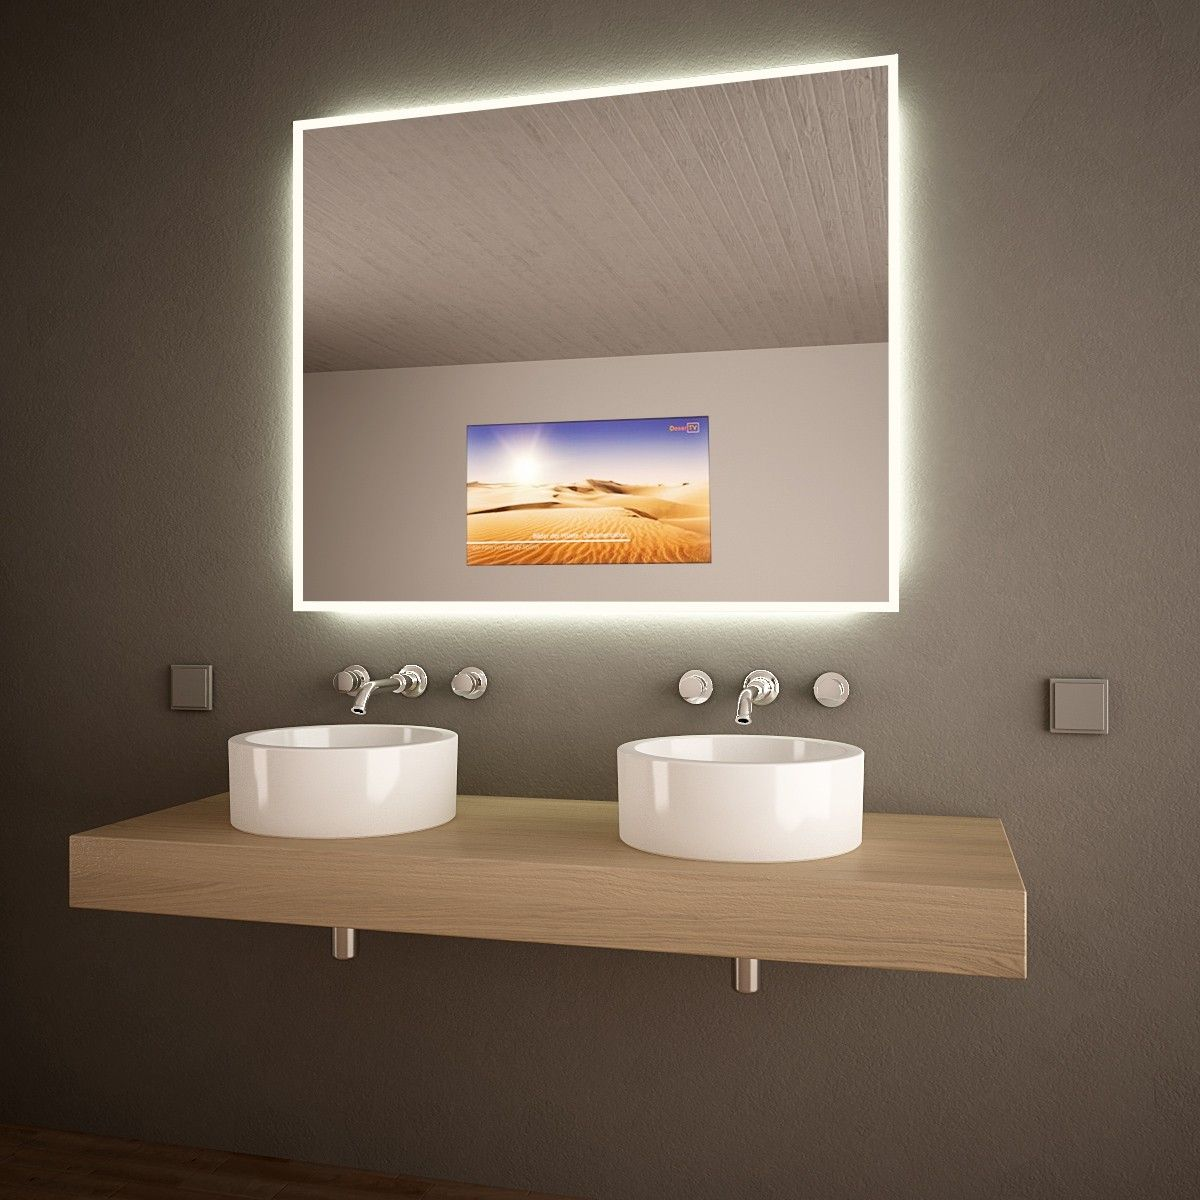 Tv Spiegel Waving Badezimmer Fernseher Badezimmer Led